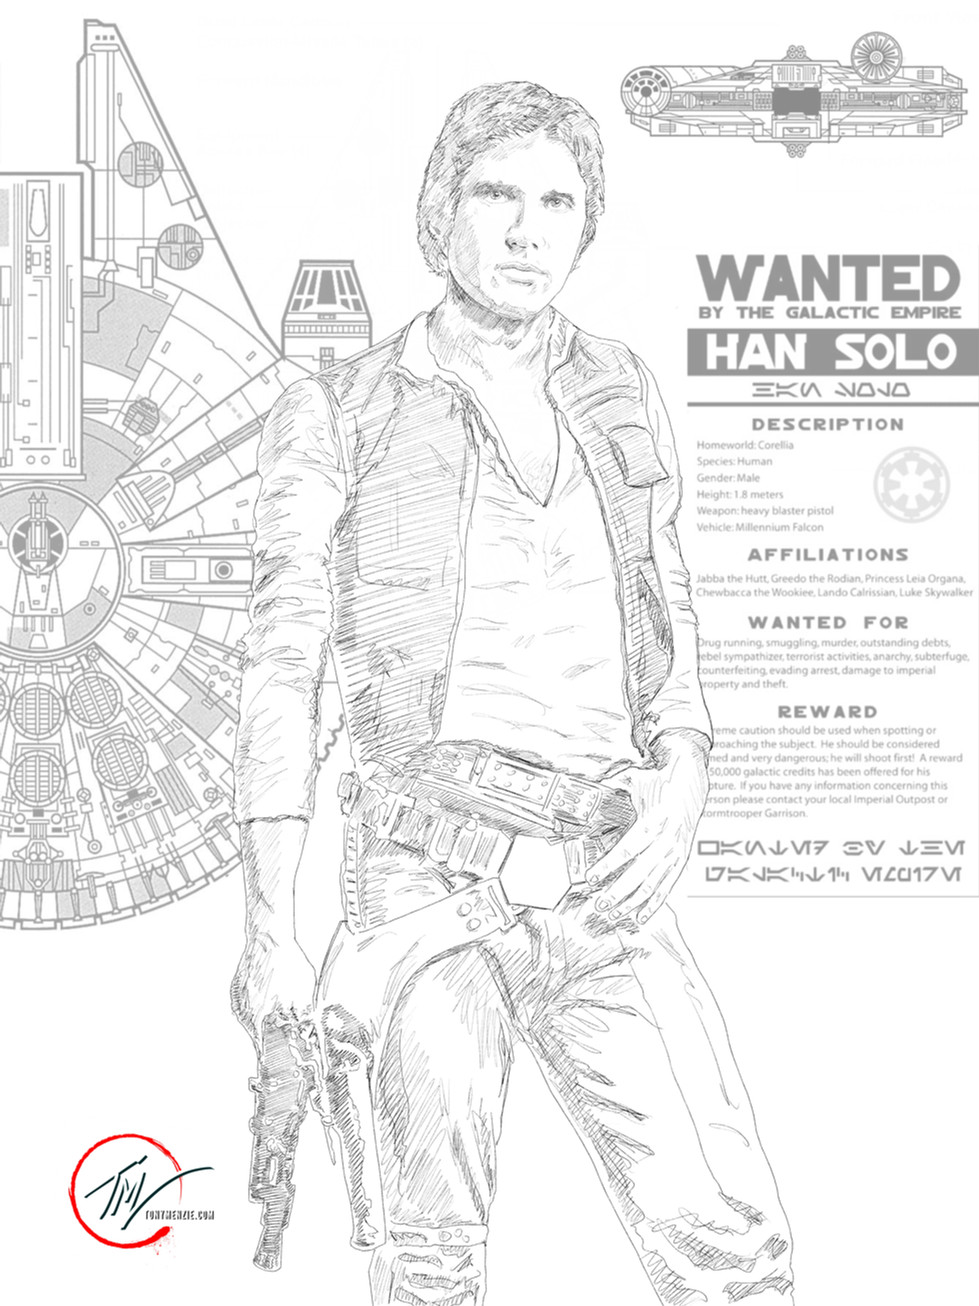 Han Solo - Wanted.jpg